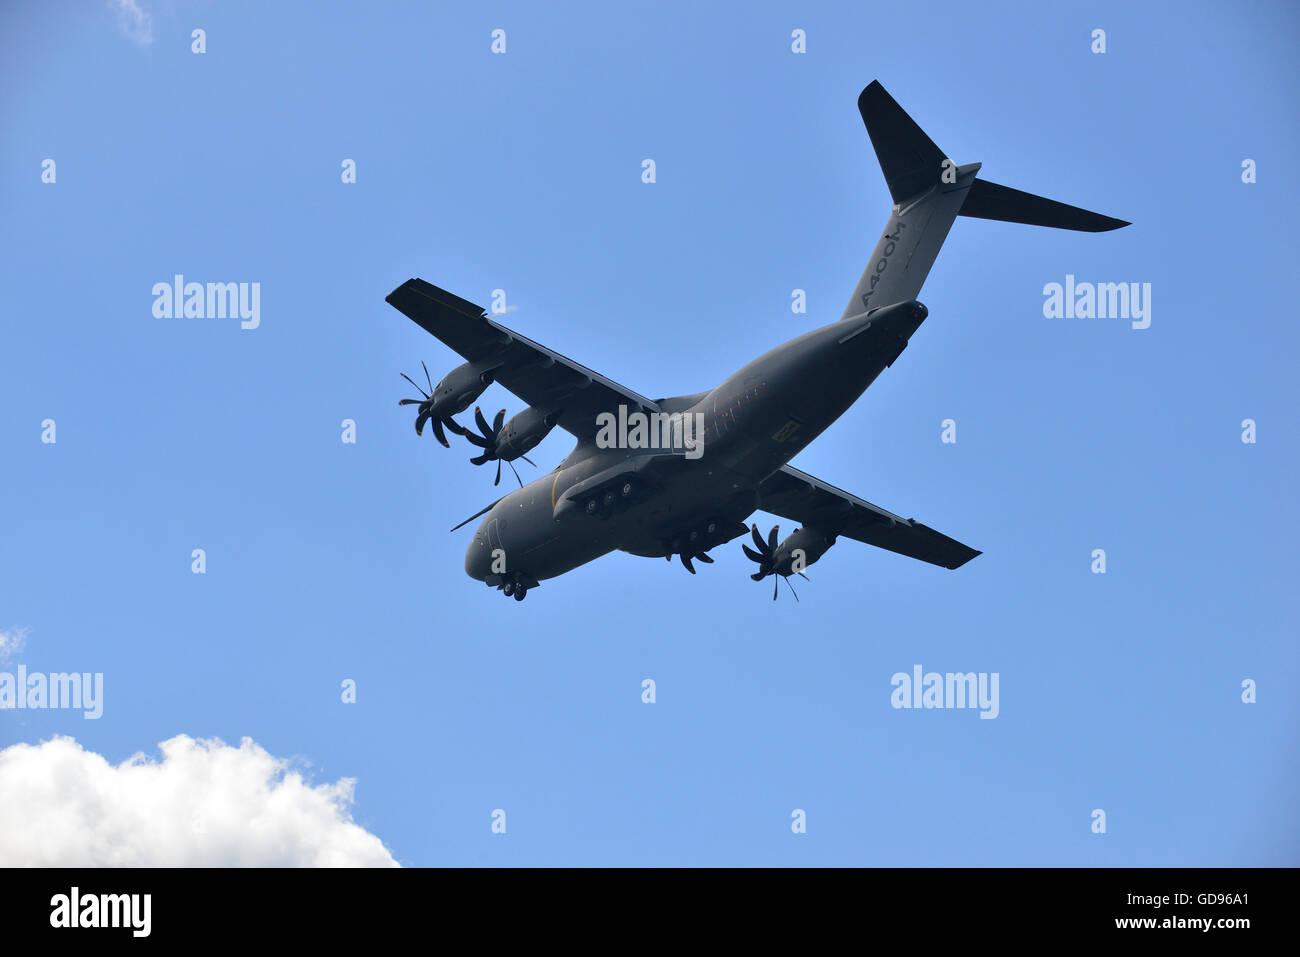 Farnborough, Hampshire, UK. 14th July, 2016. 4 th Day of the Farnborough International Trade Airshow.  Airbus Military - Stock Image